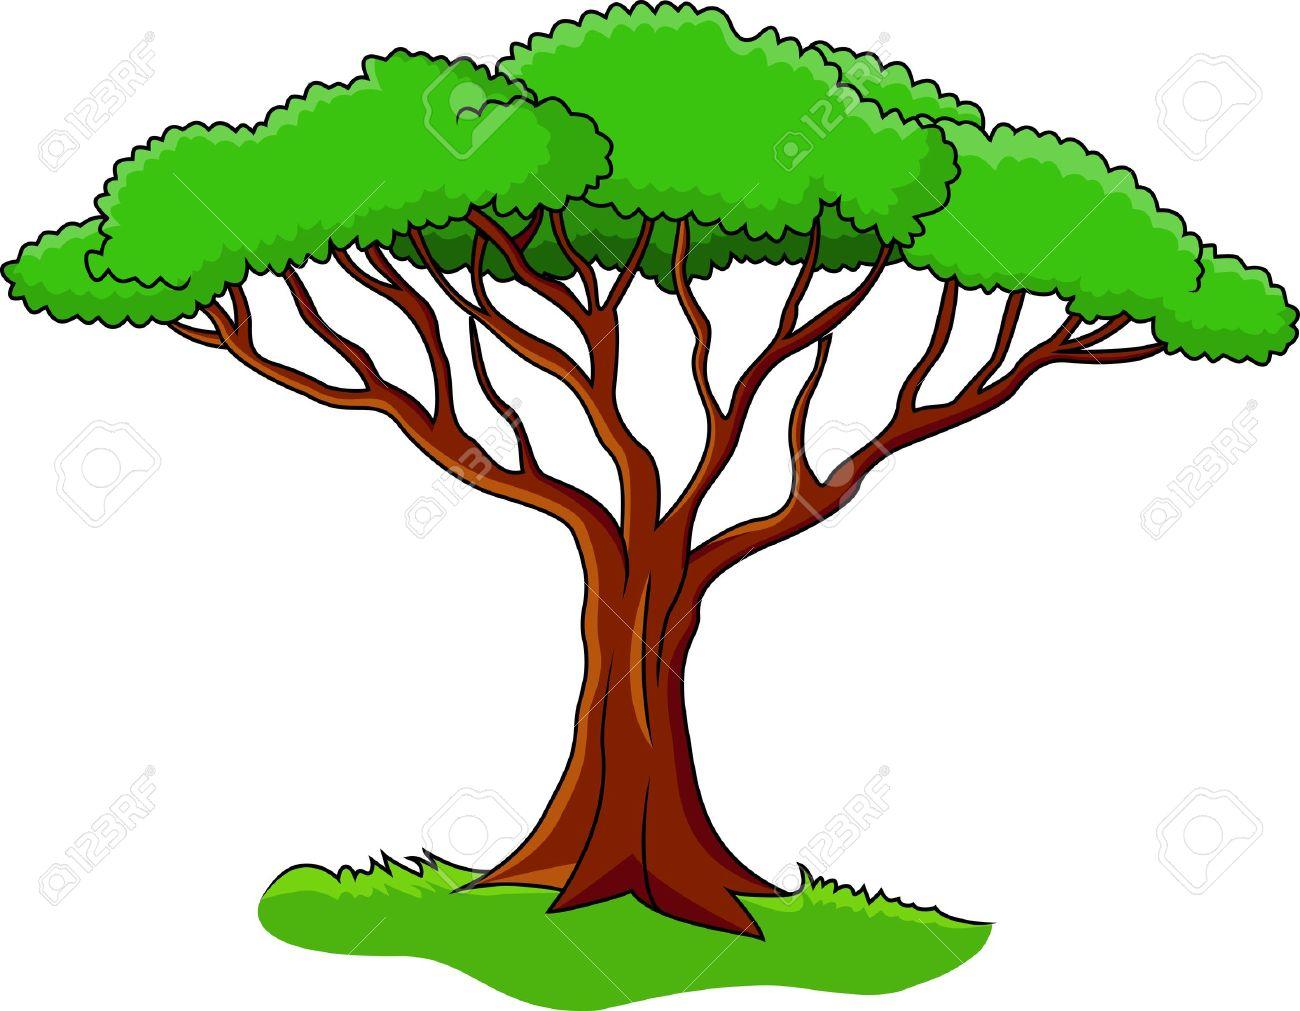 1300x1011 Shrub Clipart Forest Tree